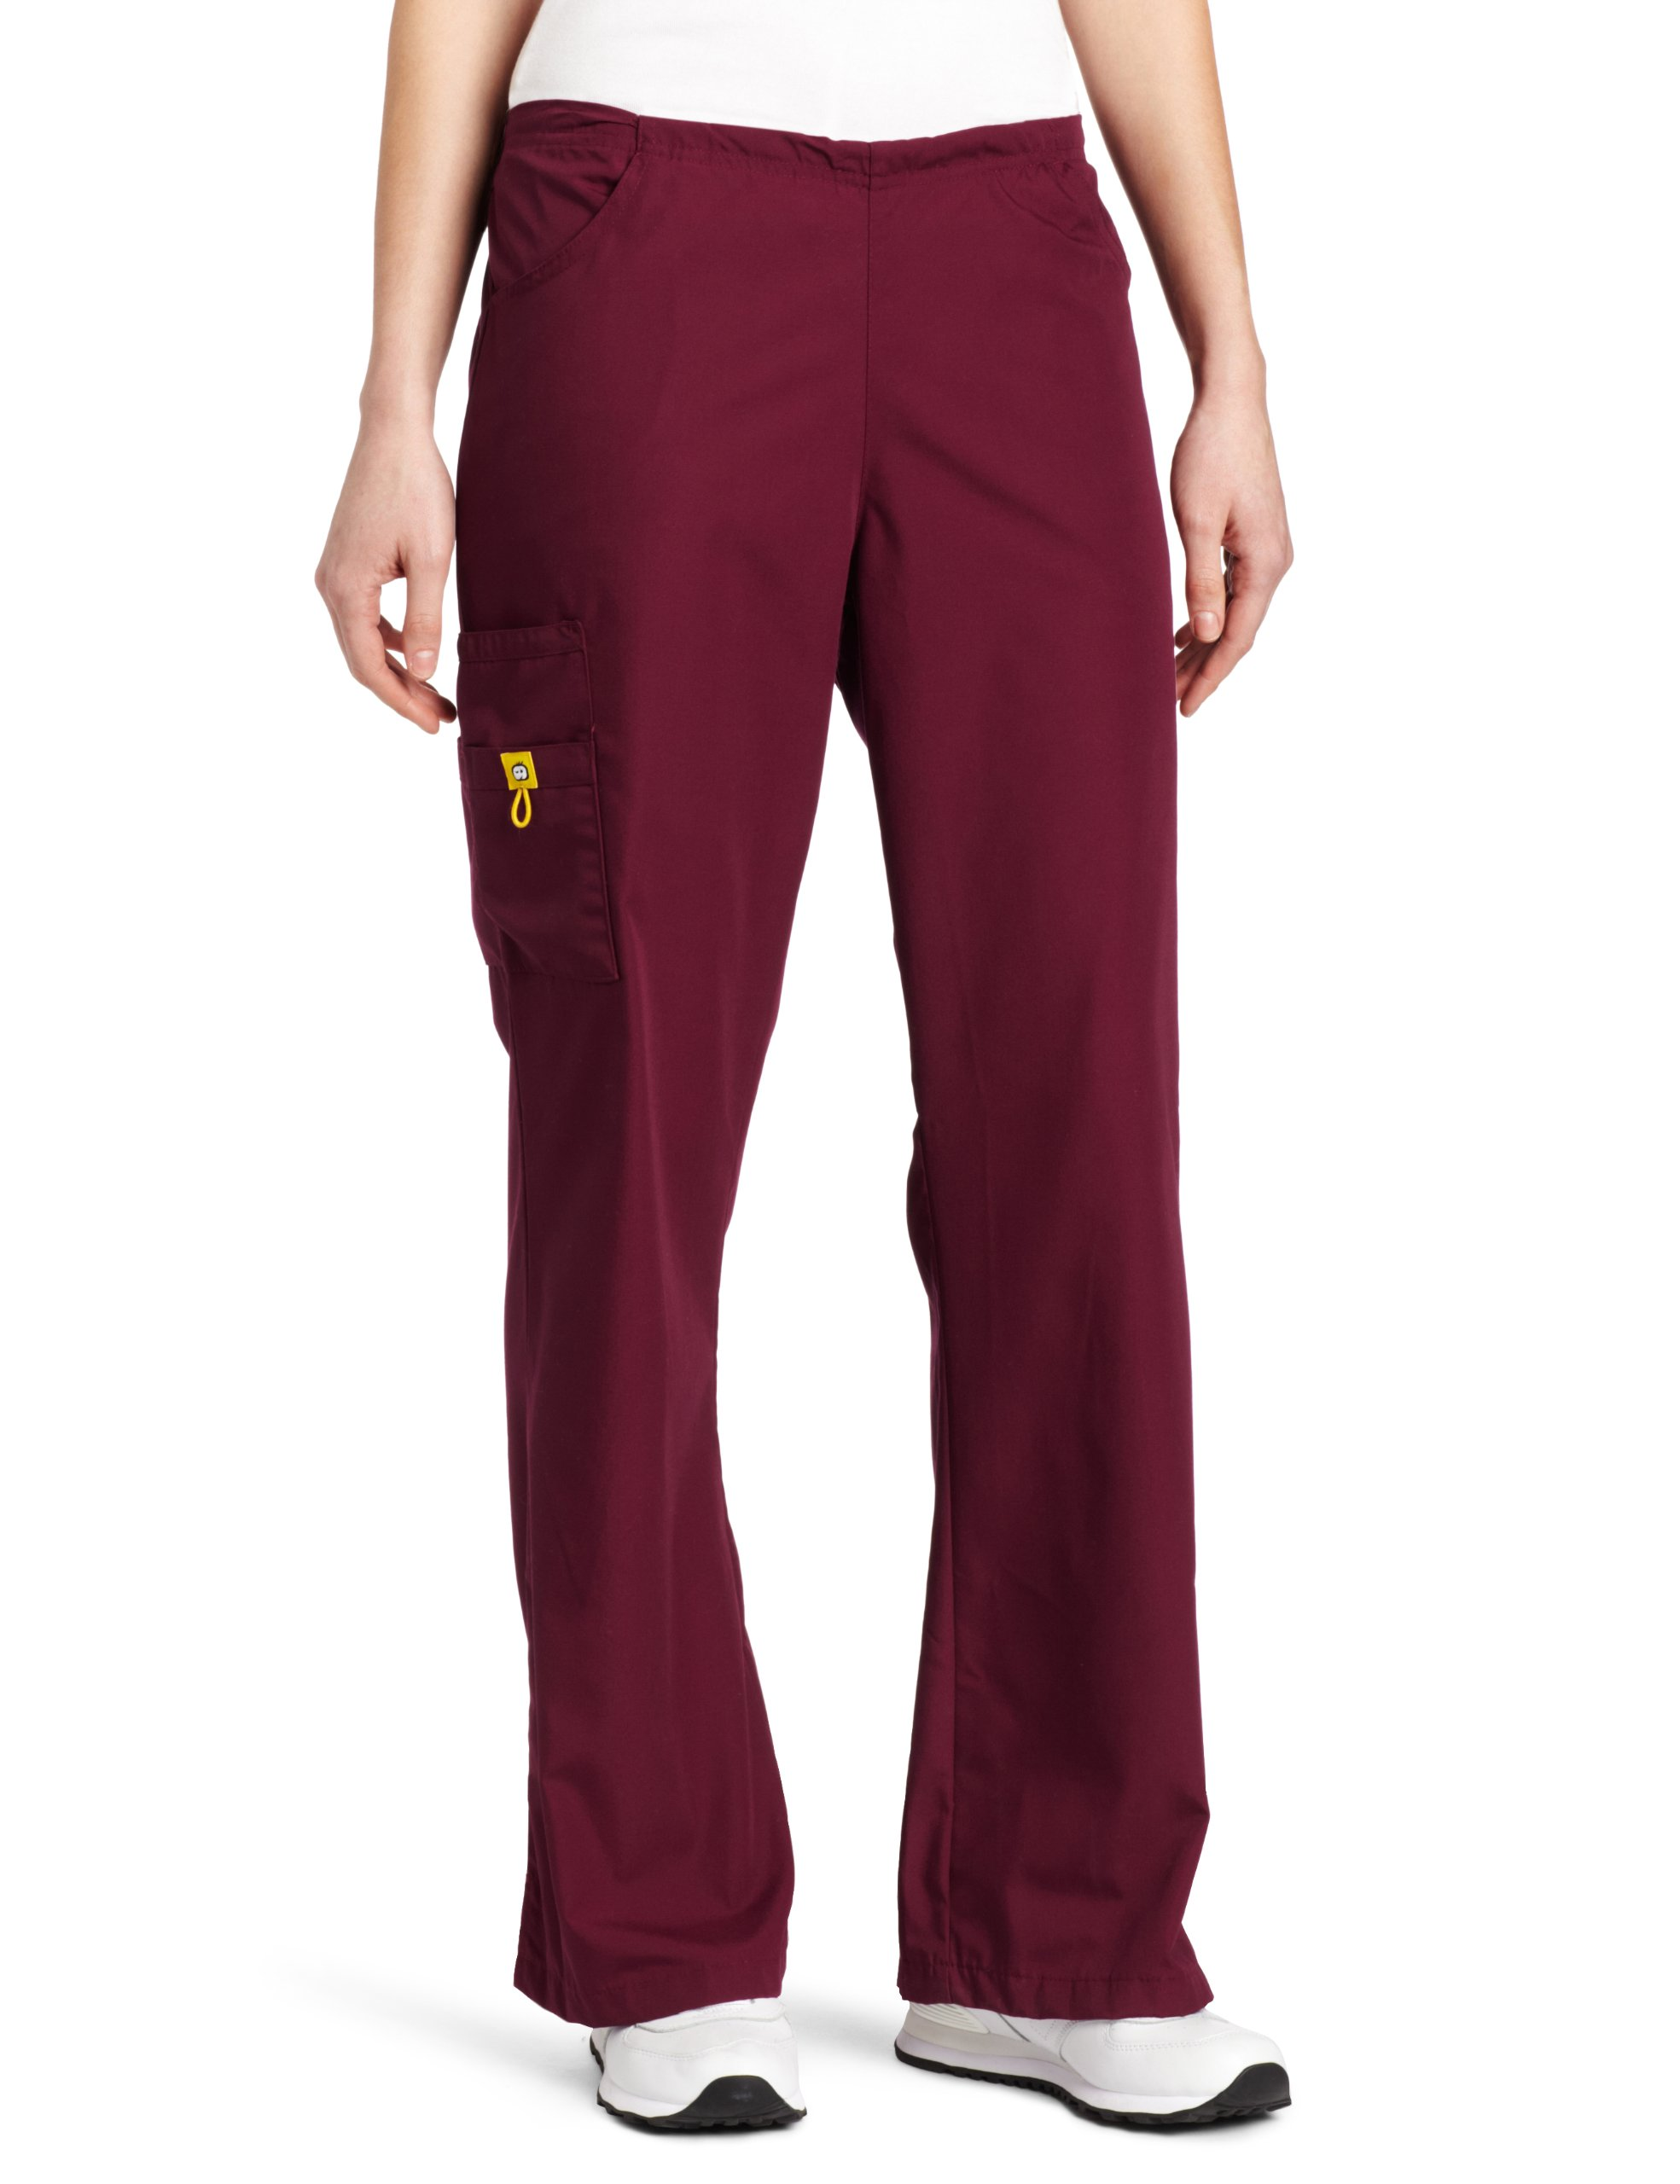 WonderWink Women's Scrubs Romeo 6 Pocket Flare Leg Pant, Wine, X-Large/Petite